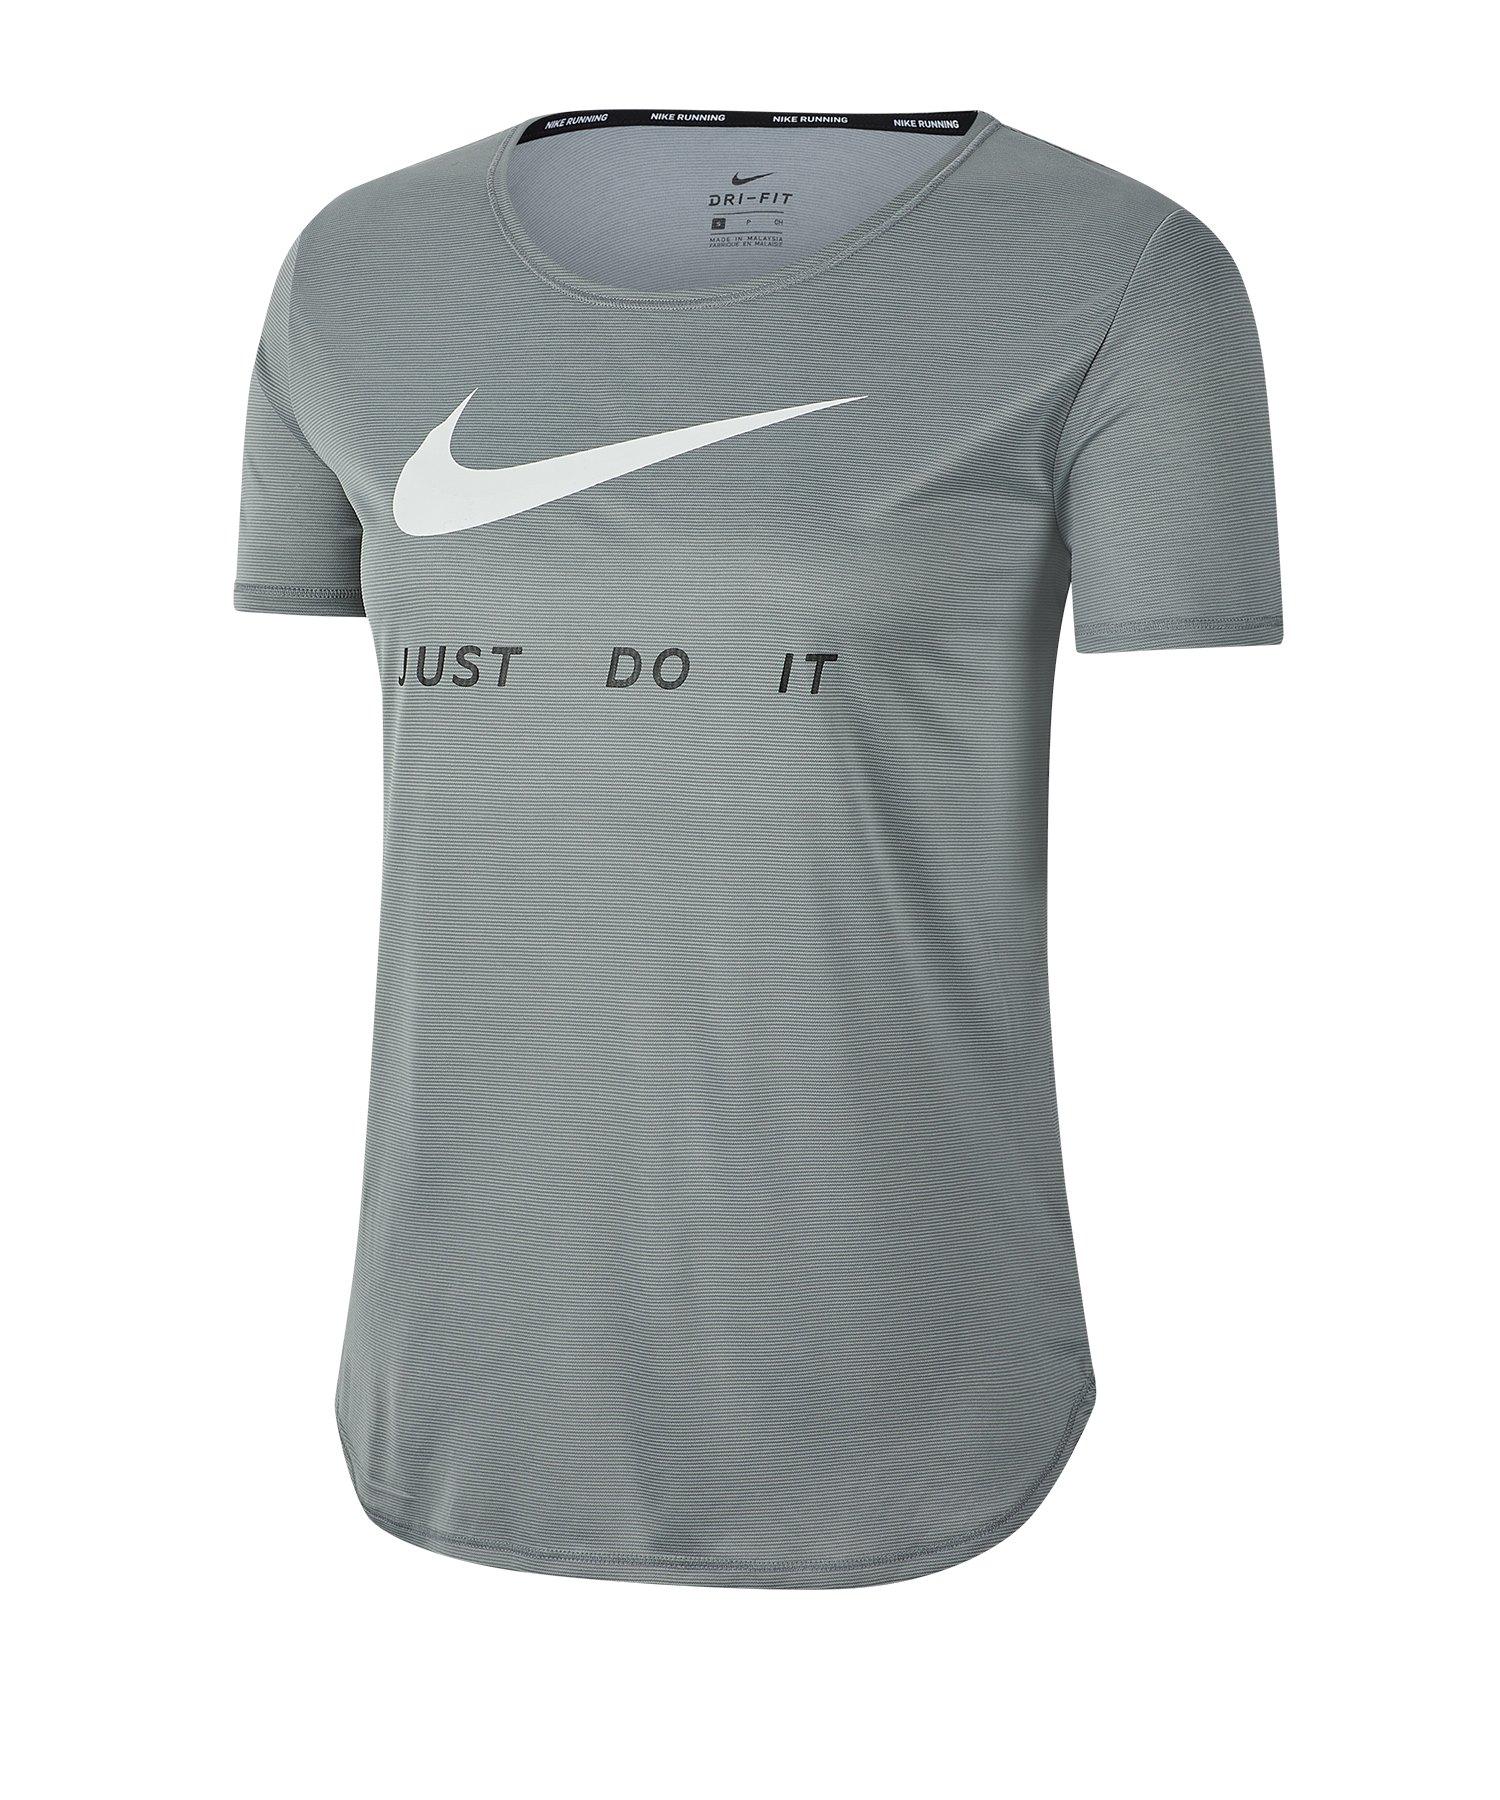 nike damen t shirt günstig